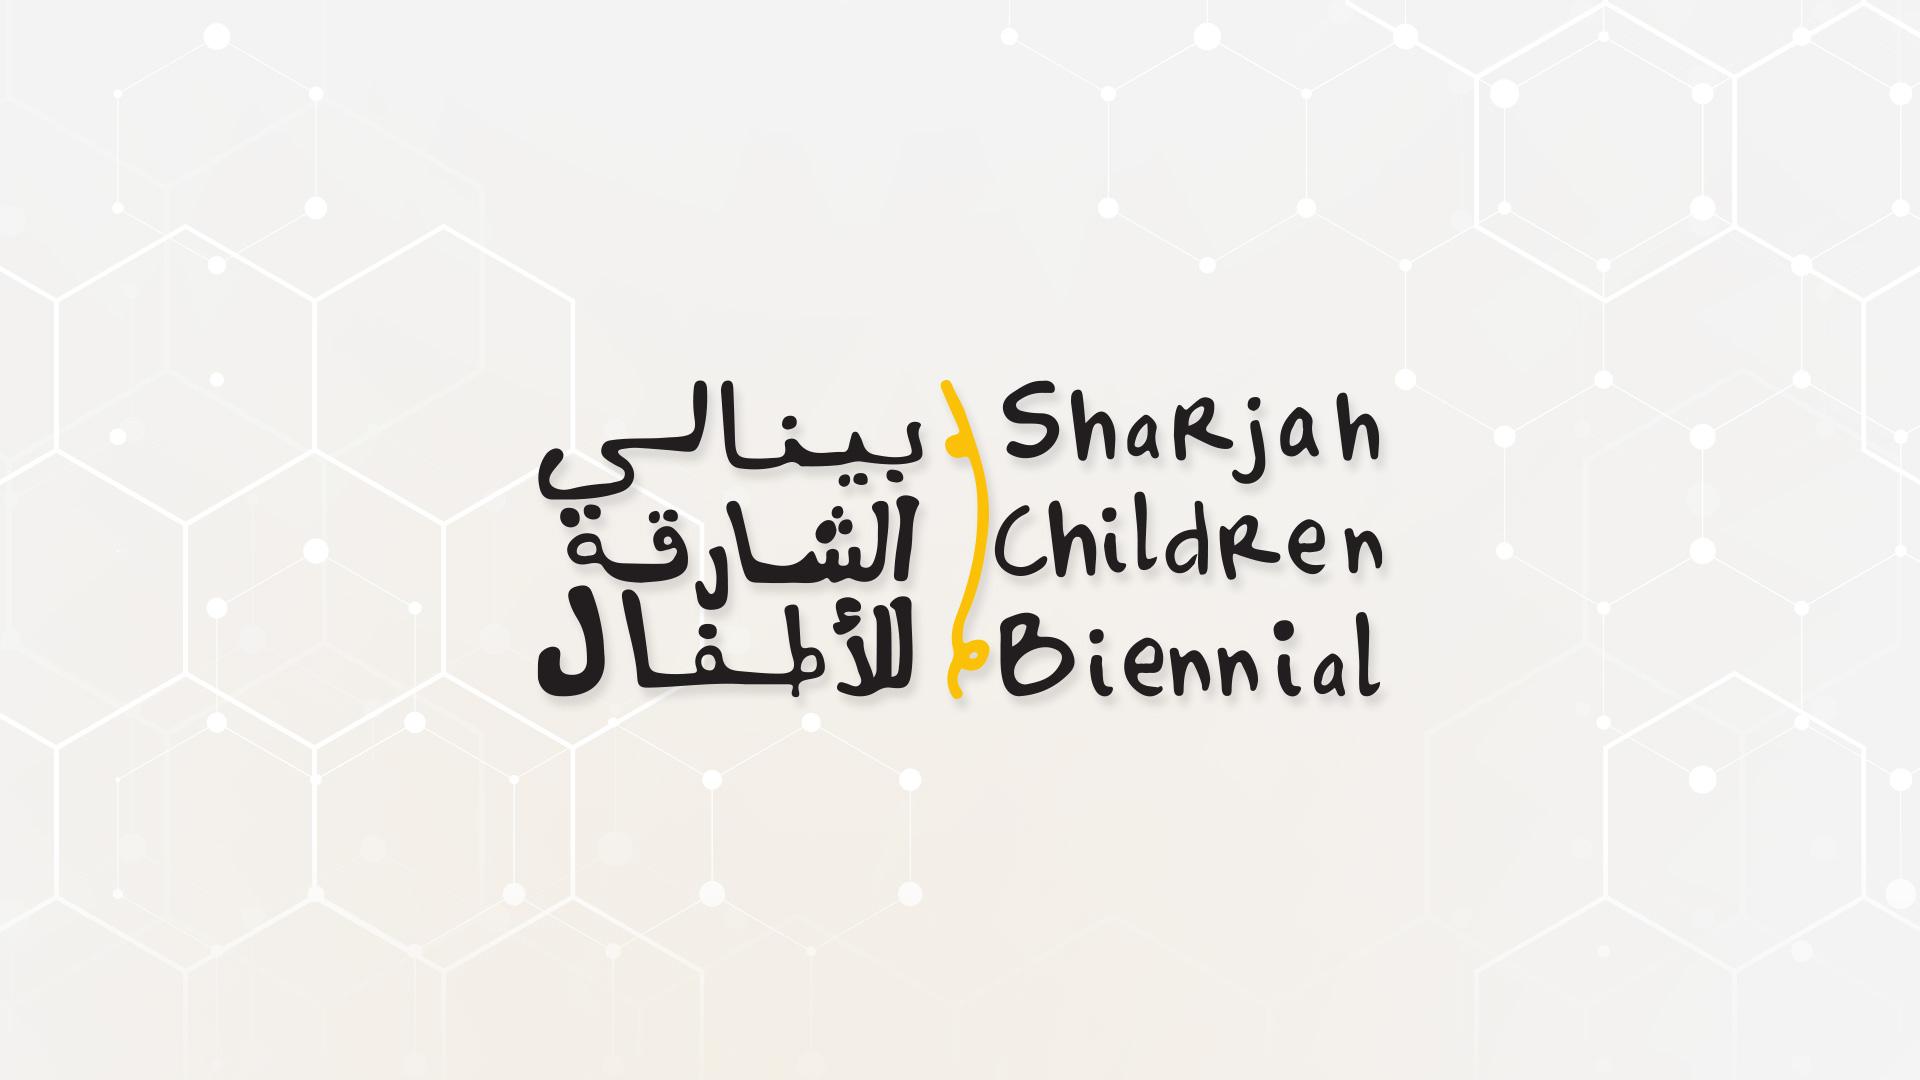 Sharjah Children Biennial